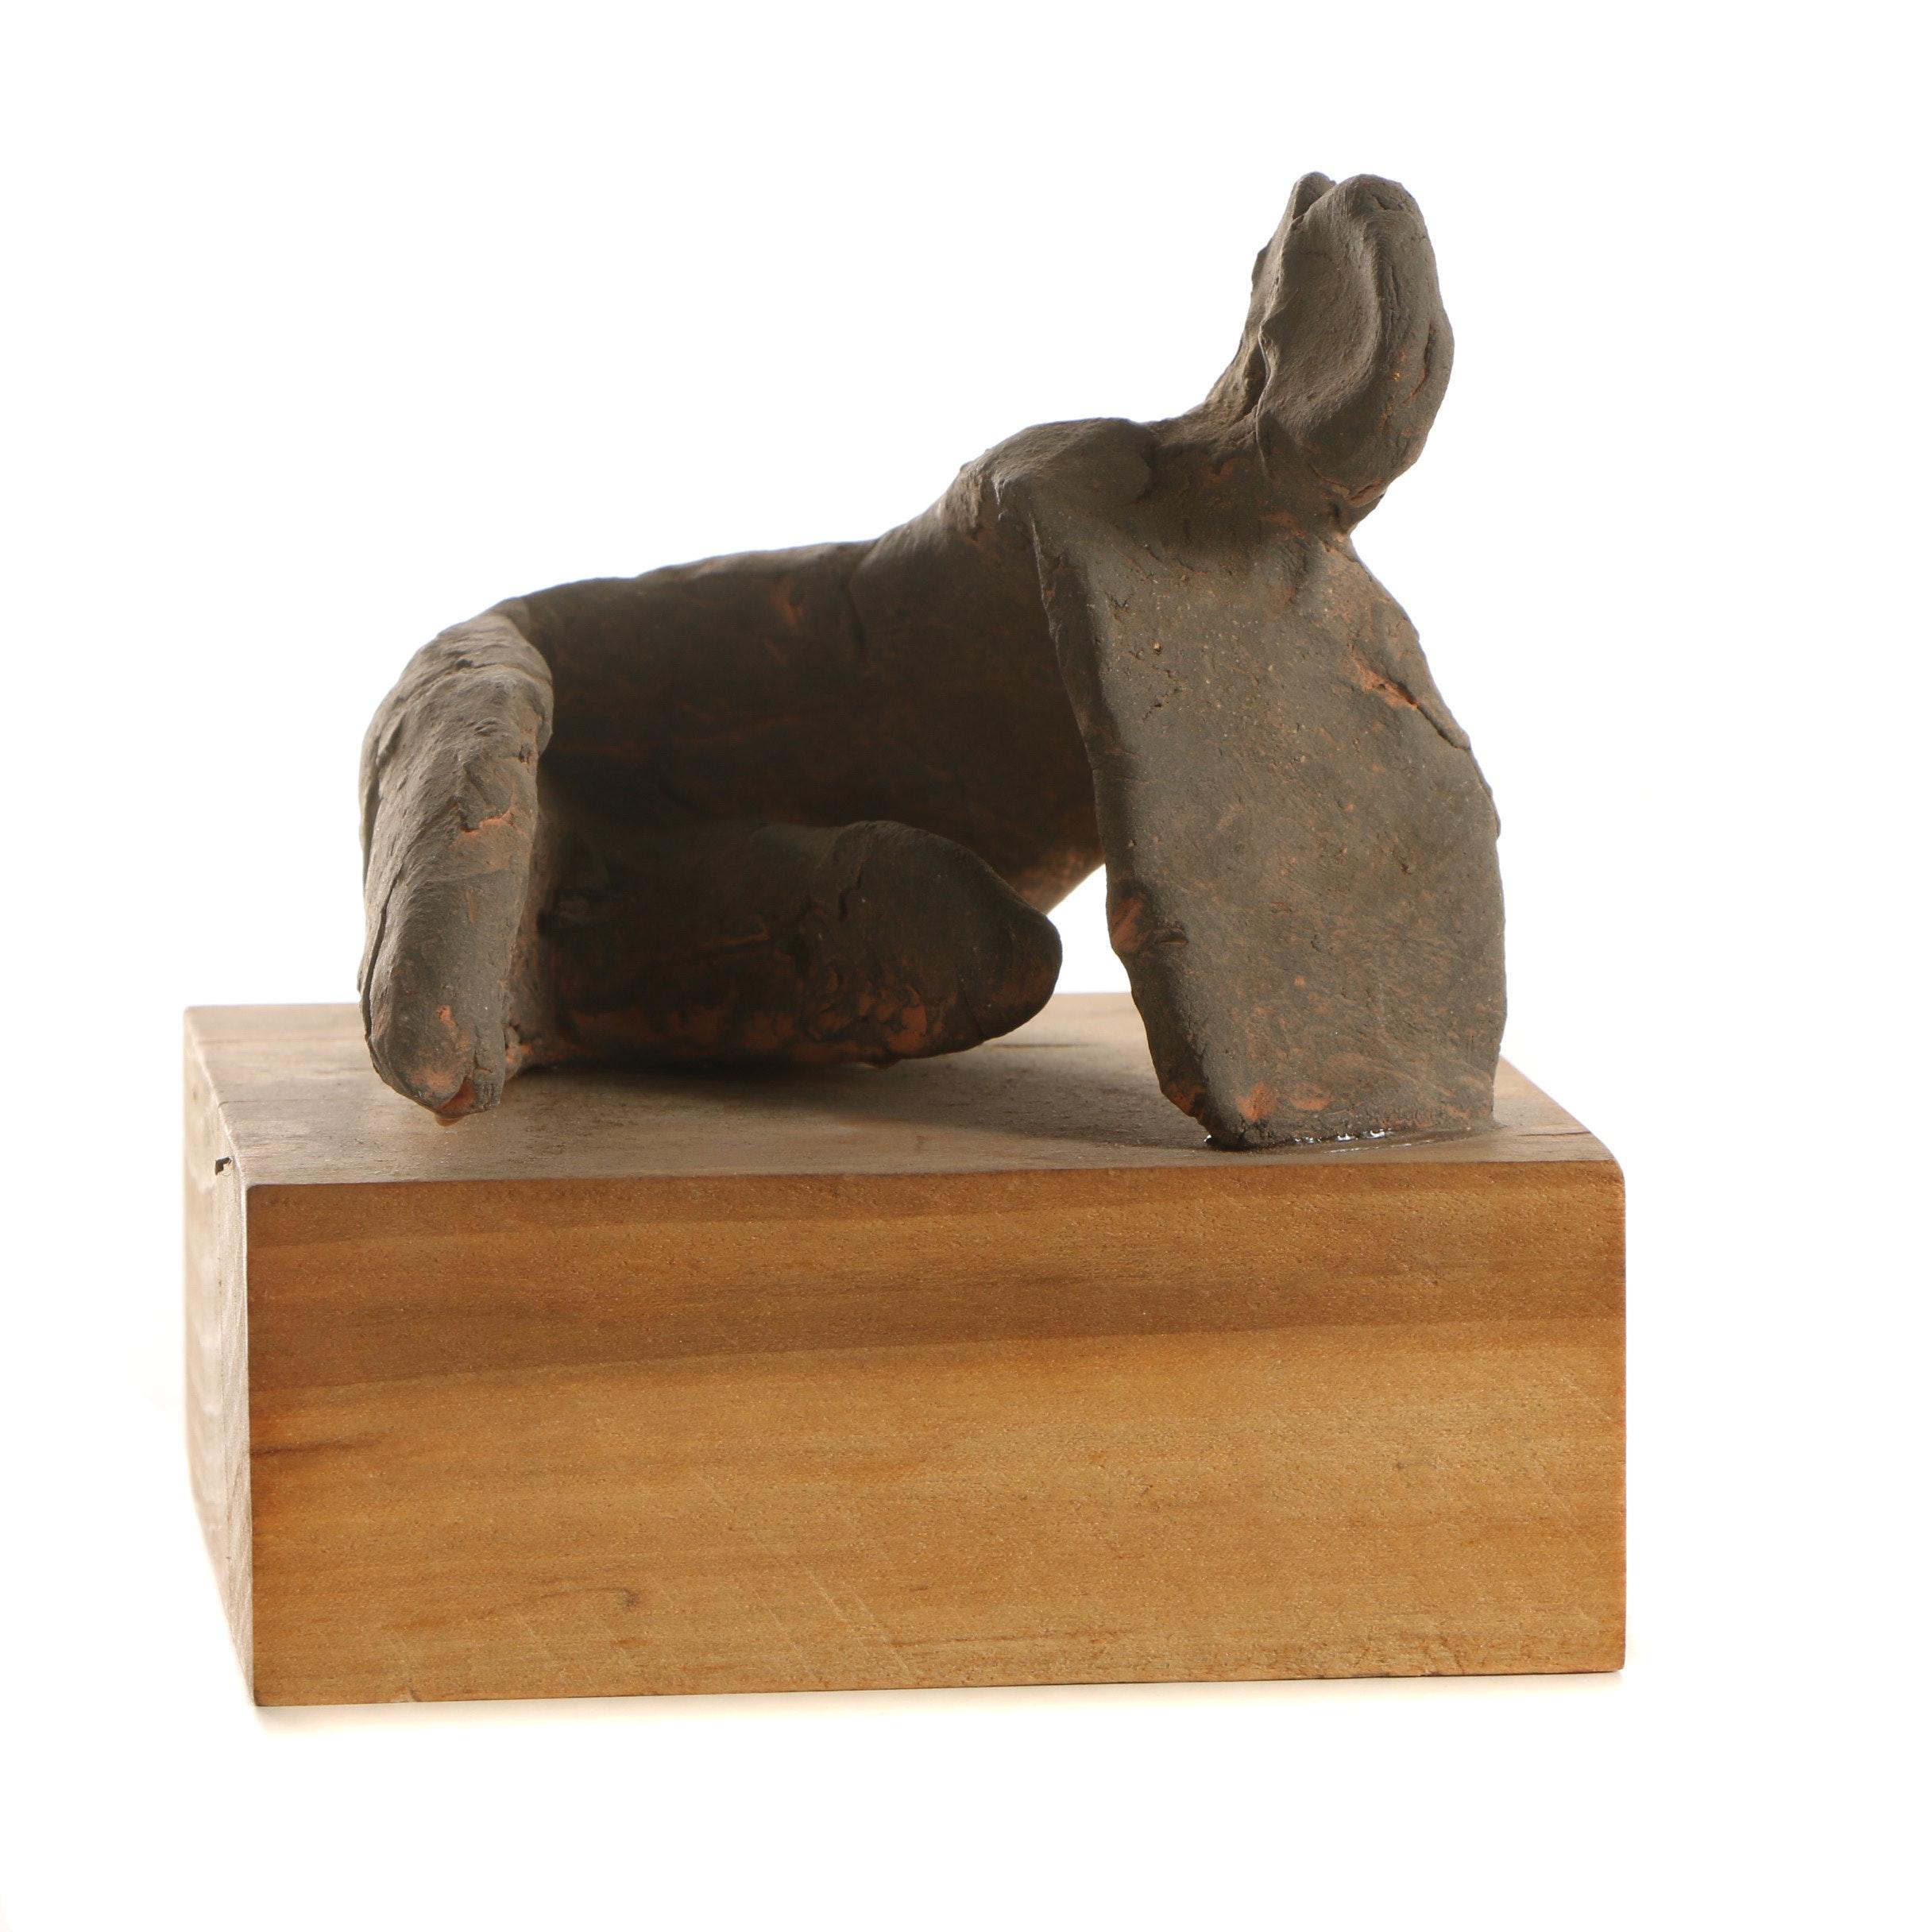 John Tuska Hand-Sculpted Ceramic Abstract Figure